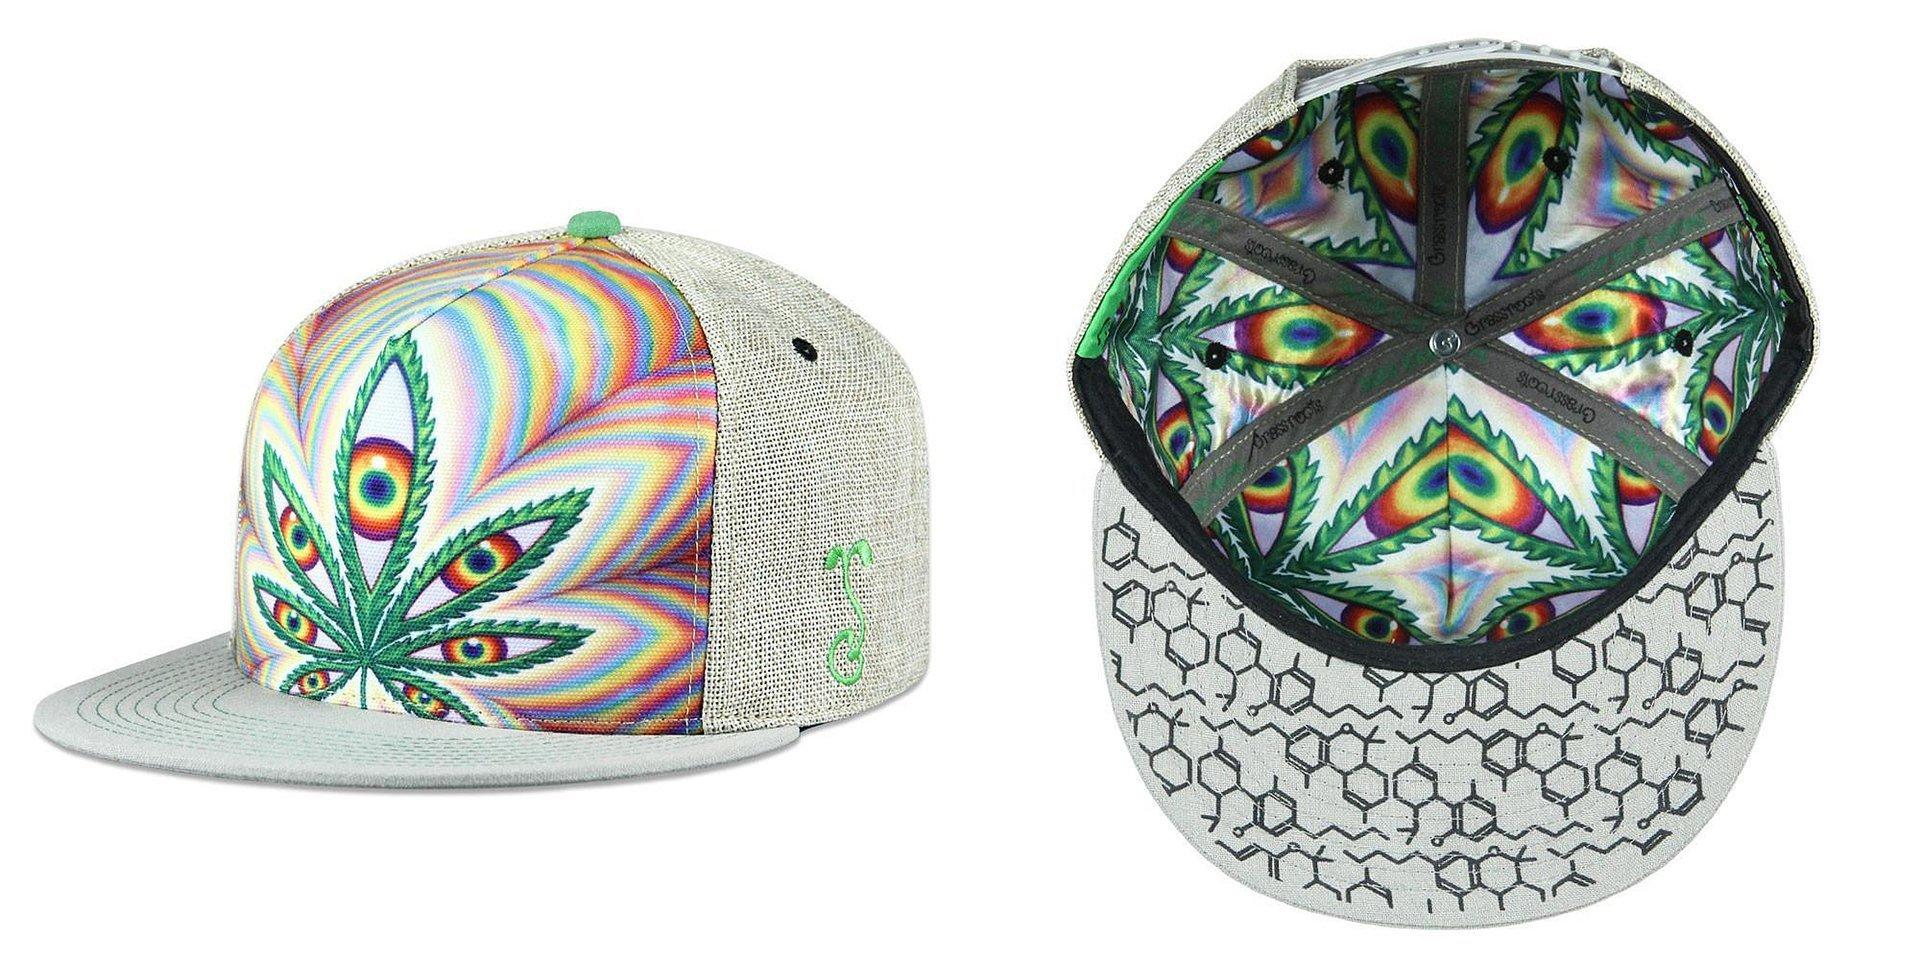 Alex Grey Higher Vision 2017 Tan Snapback Grassroots California Hat